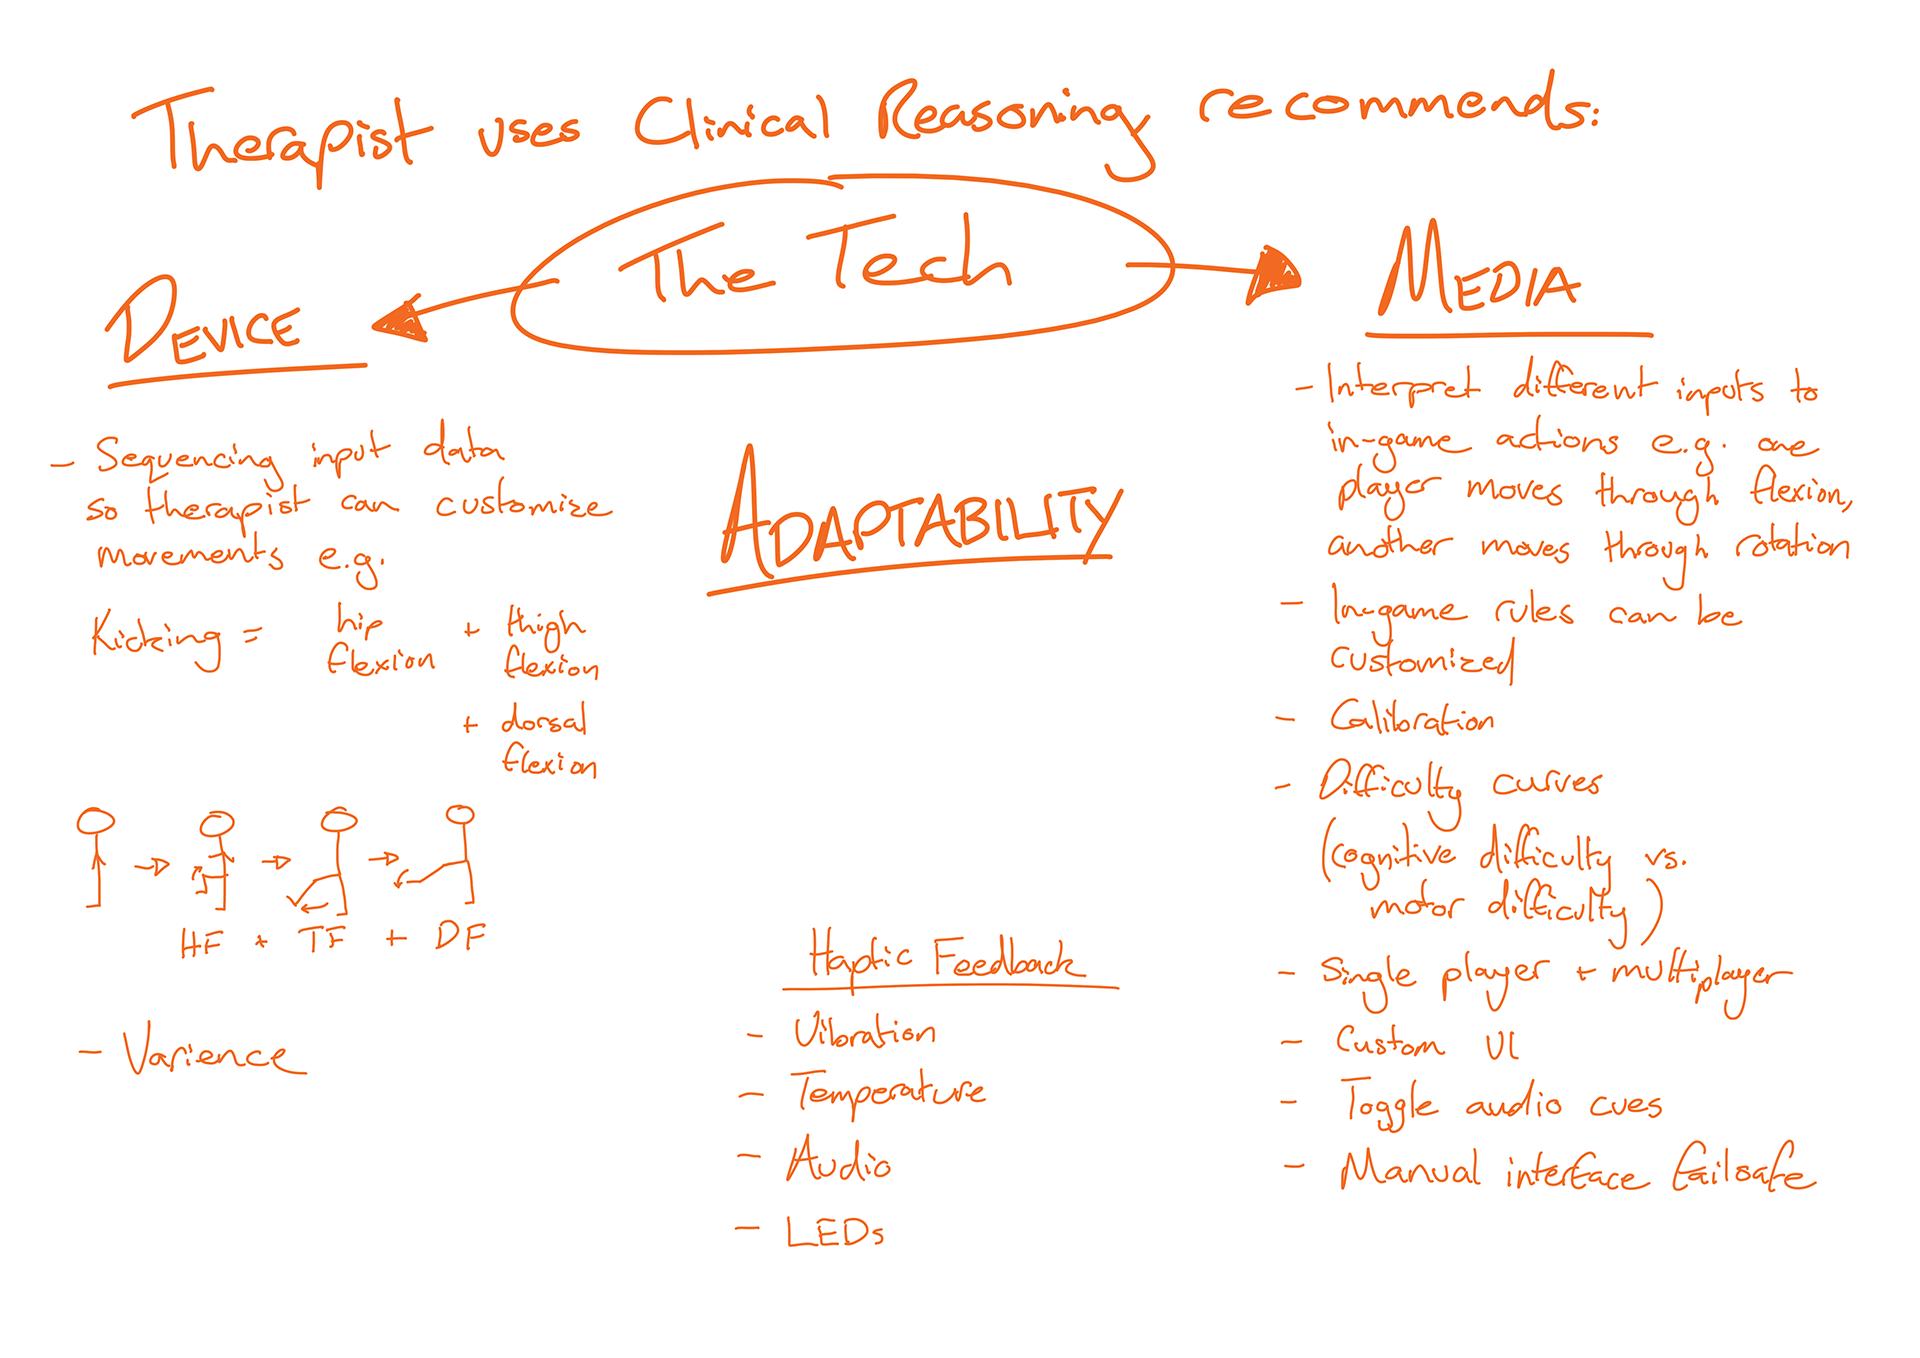 Figure 4.1 - Adaptability